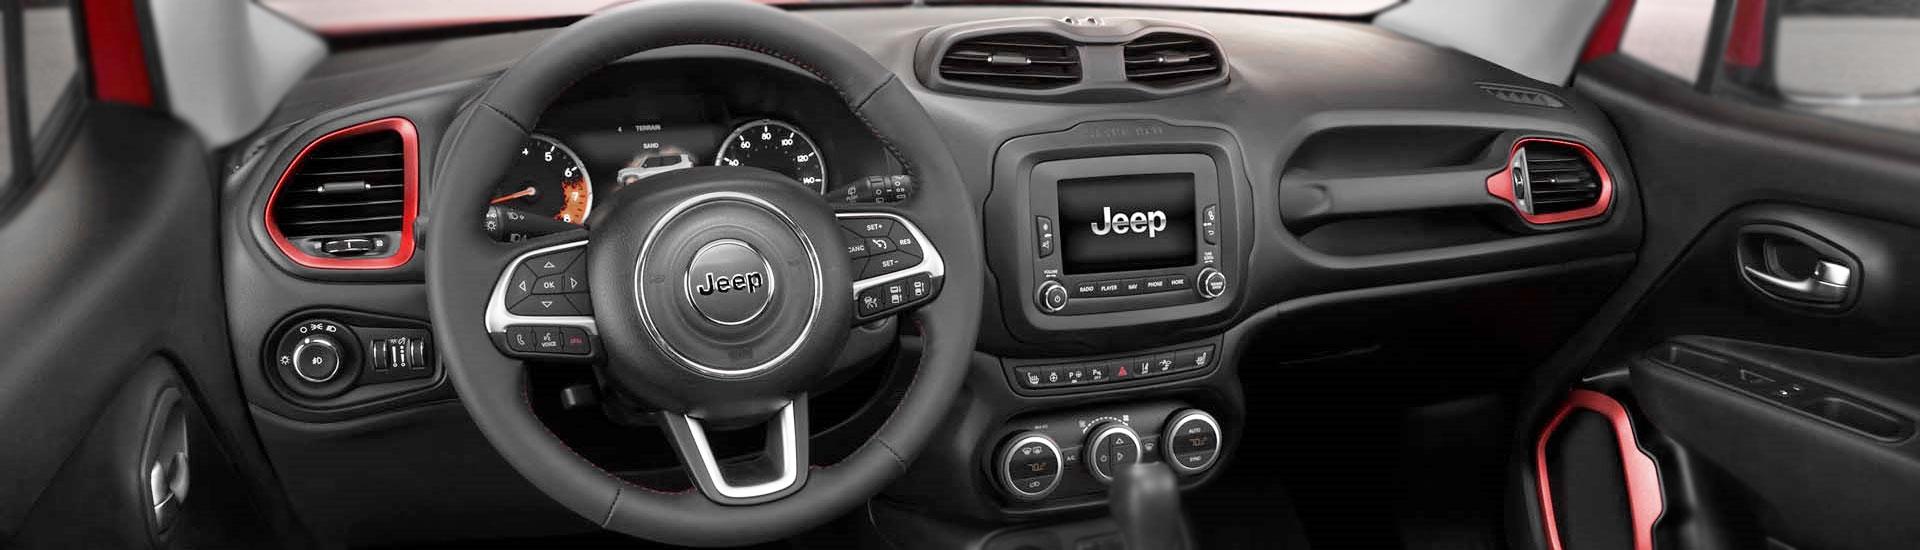 Jeep compass dash kits custom jeep compass dash kit - 2016 jeep compass interior lights ...